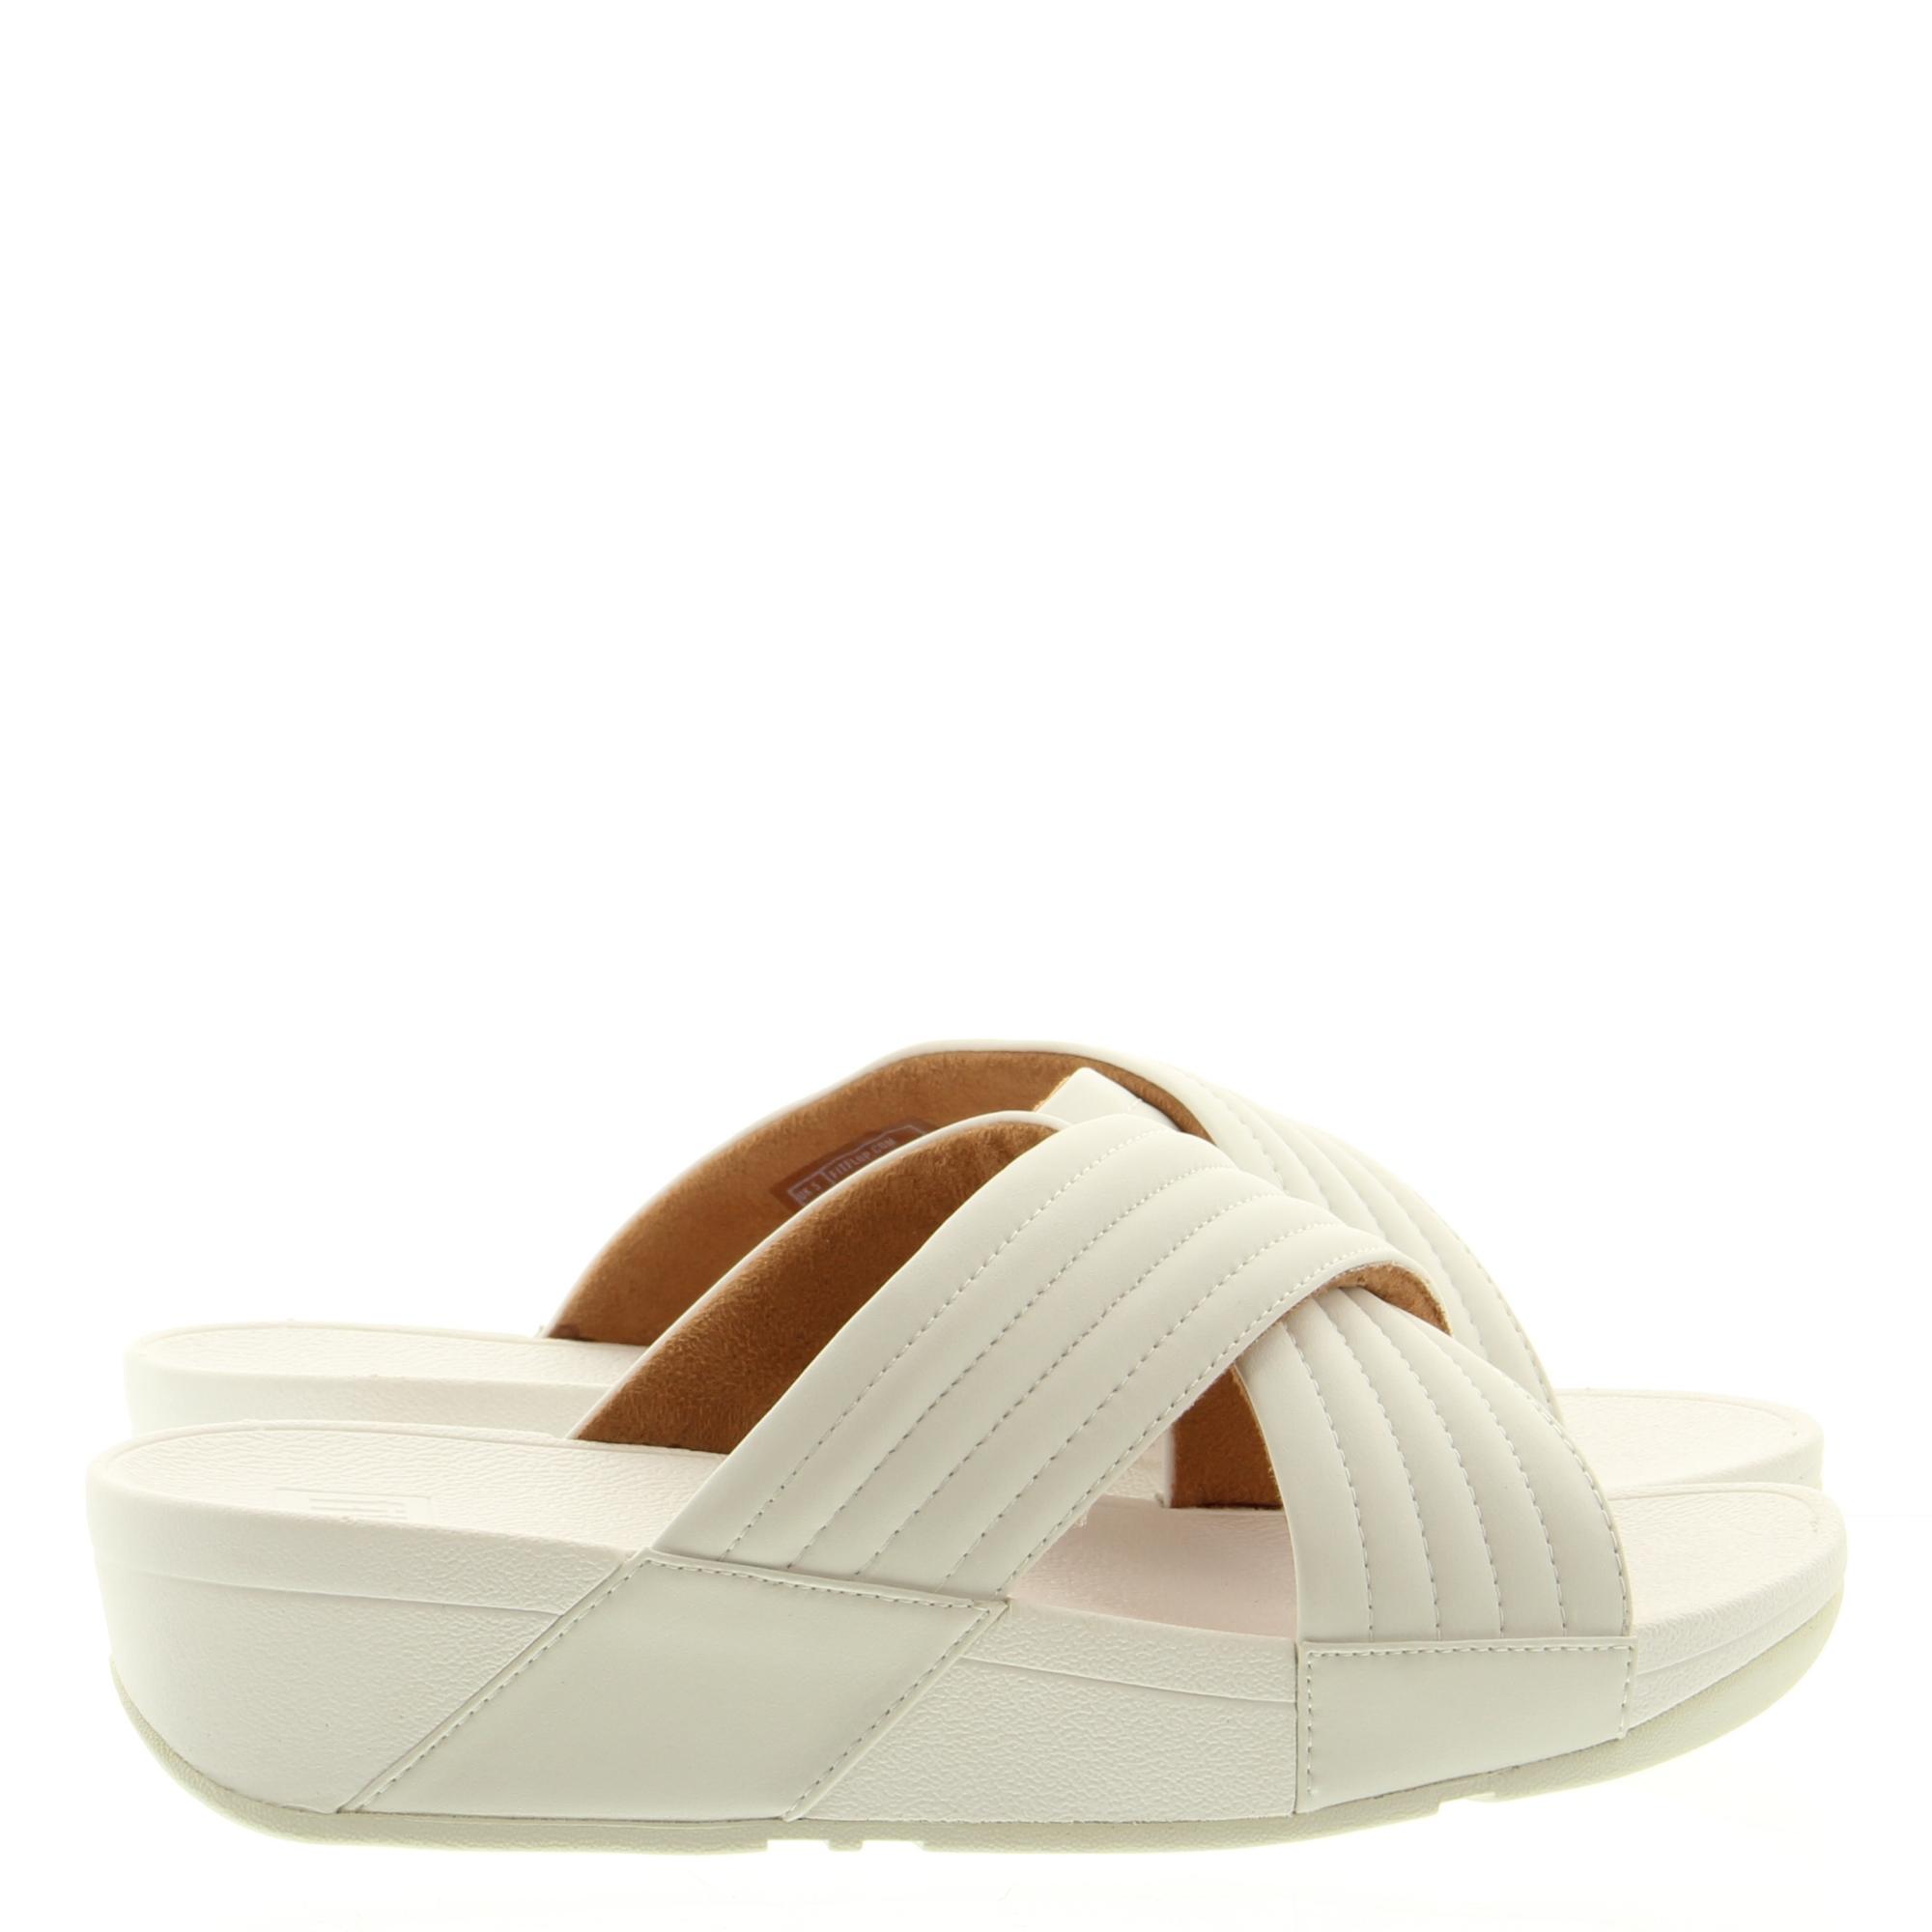 Fitflop Lulu Padded Slide urban white